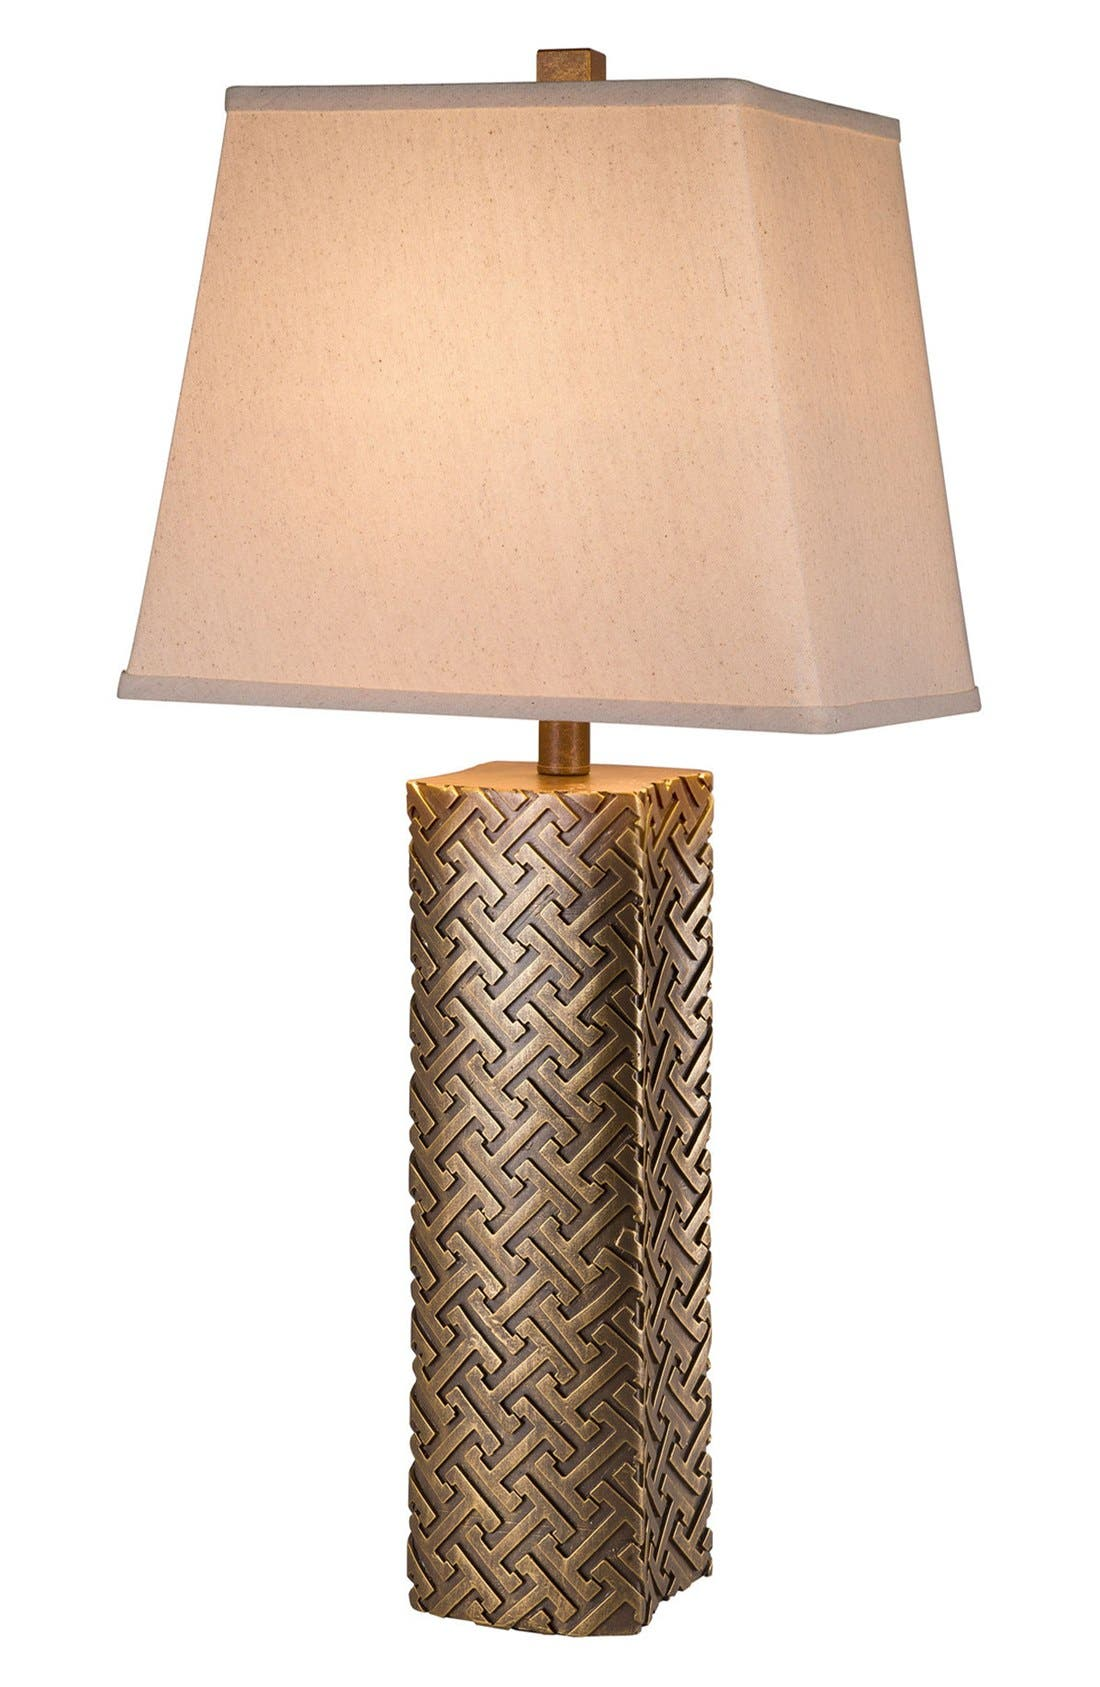 JALEXANDER LIGHTING JAlexander Geometric Metallic Table Lamp